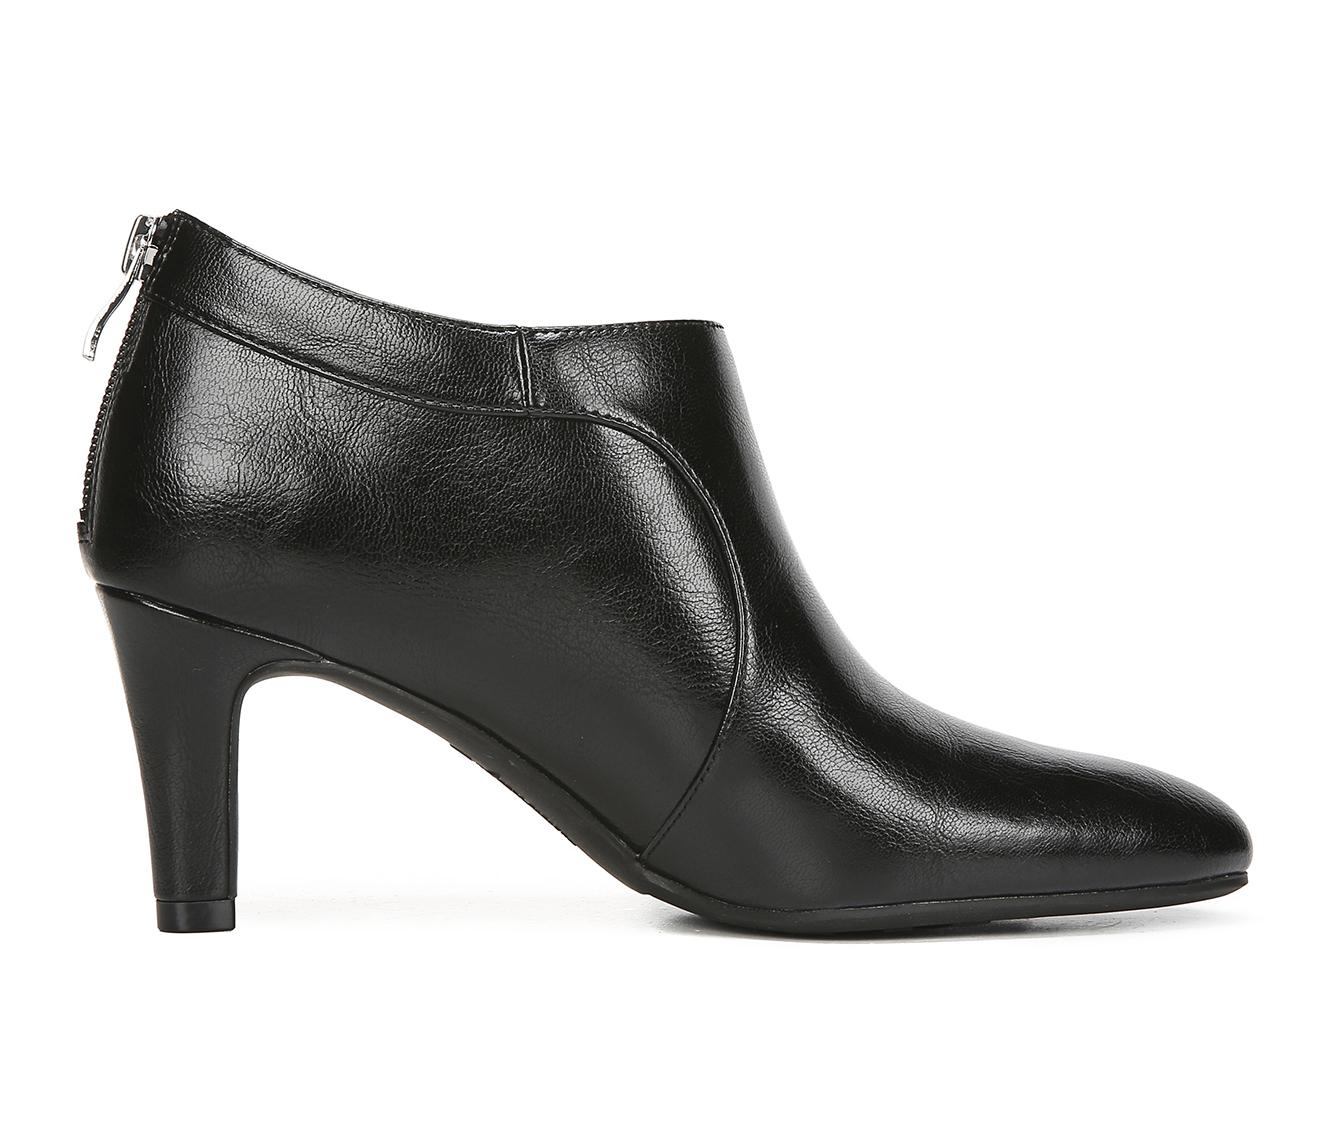 LifeStride Georgia Women's Dress Shoe (Black - Faux Leather)